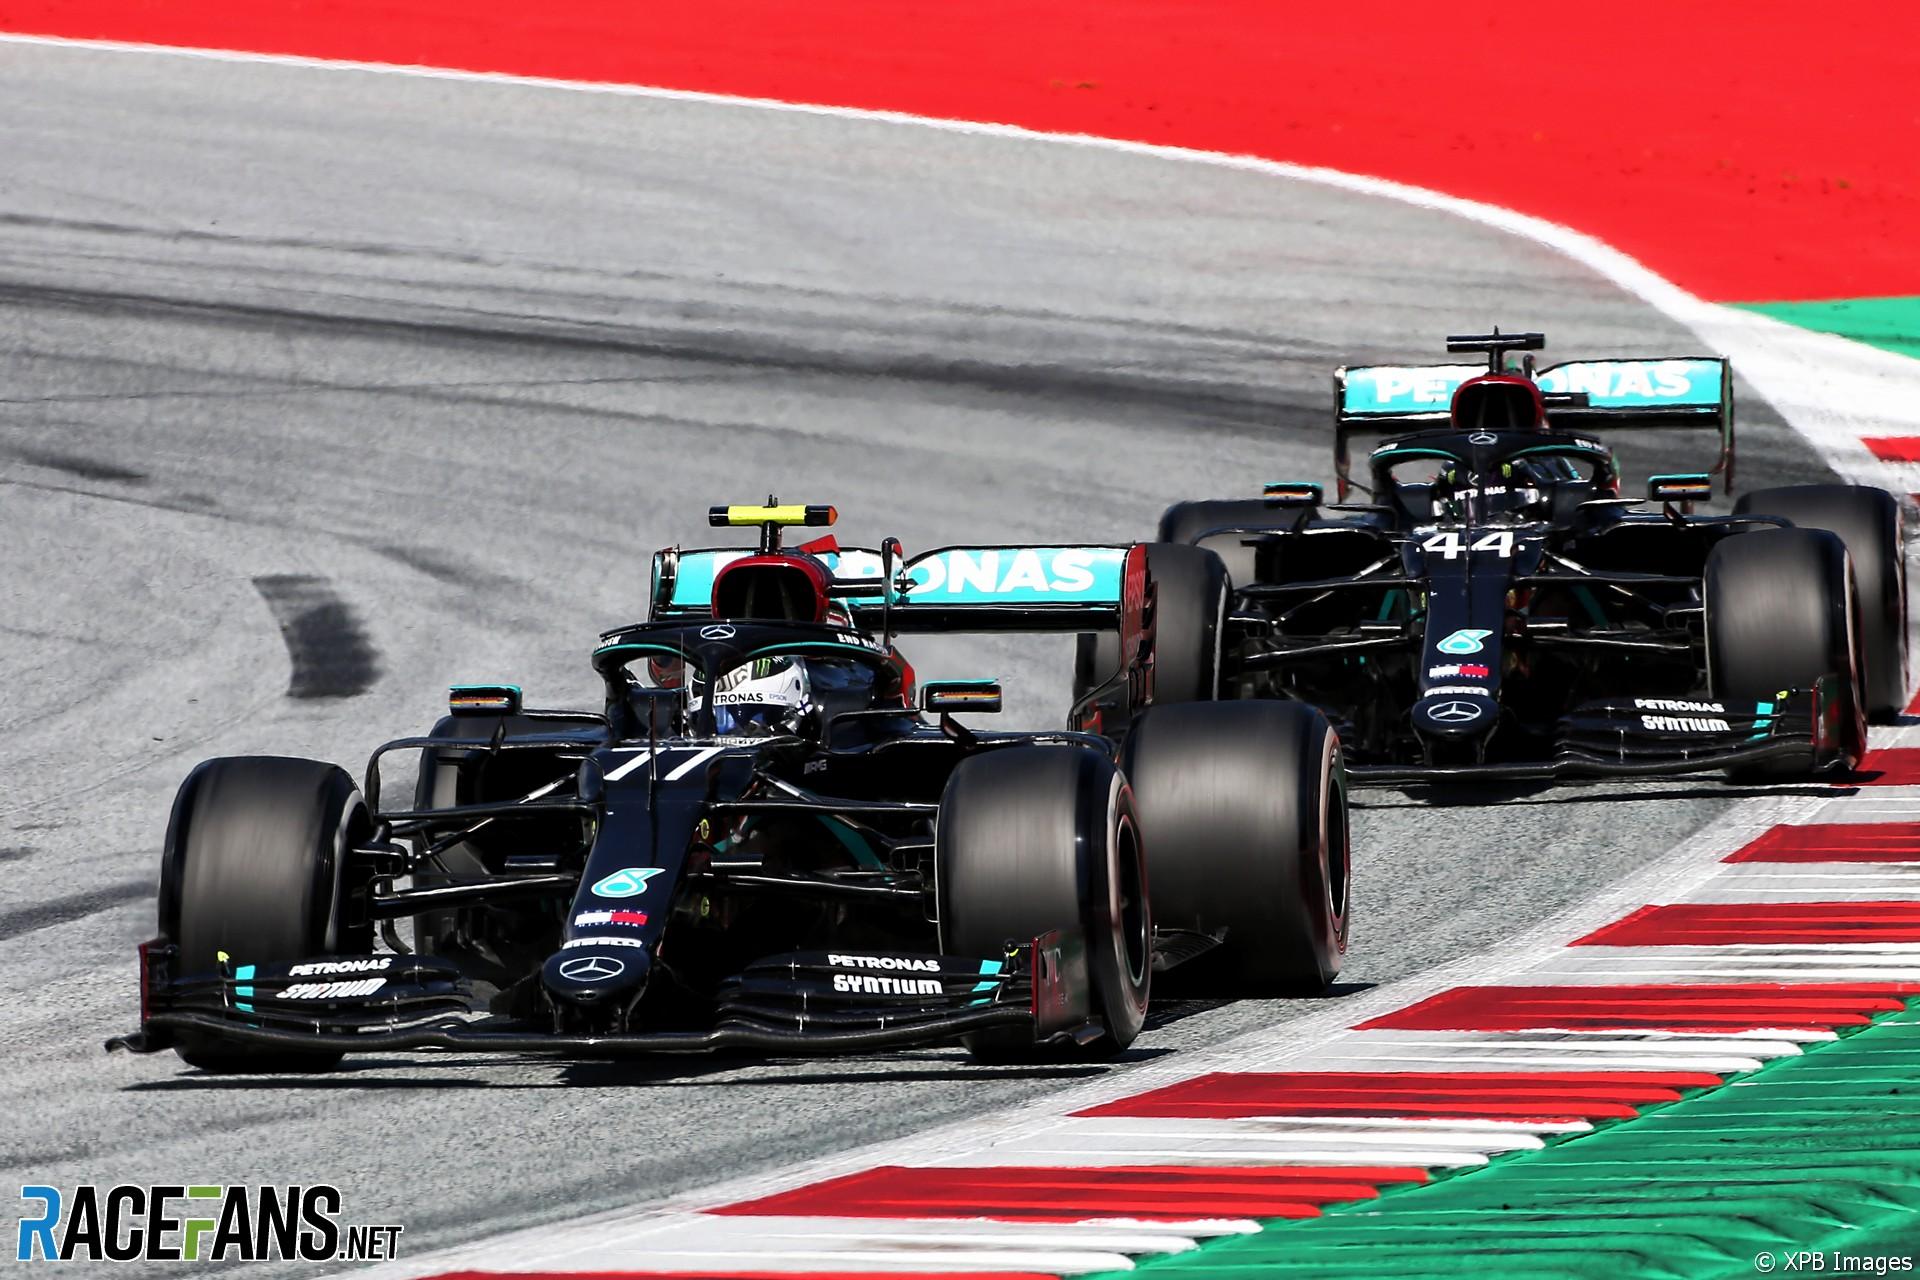 Valtteri Bottas, Lewis Hamilton, Mercedes, Red Bull Ring, 2020